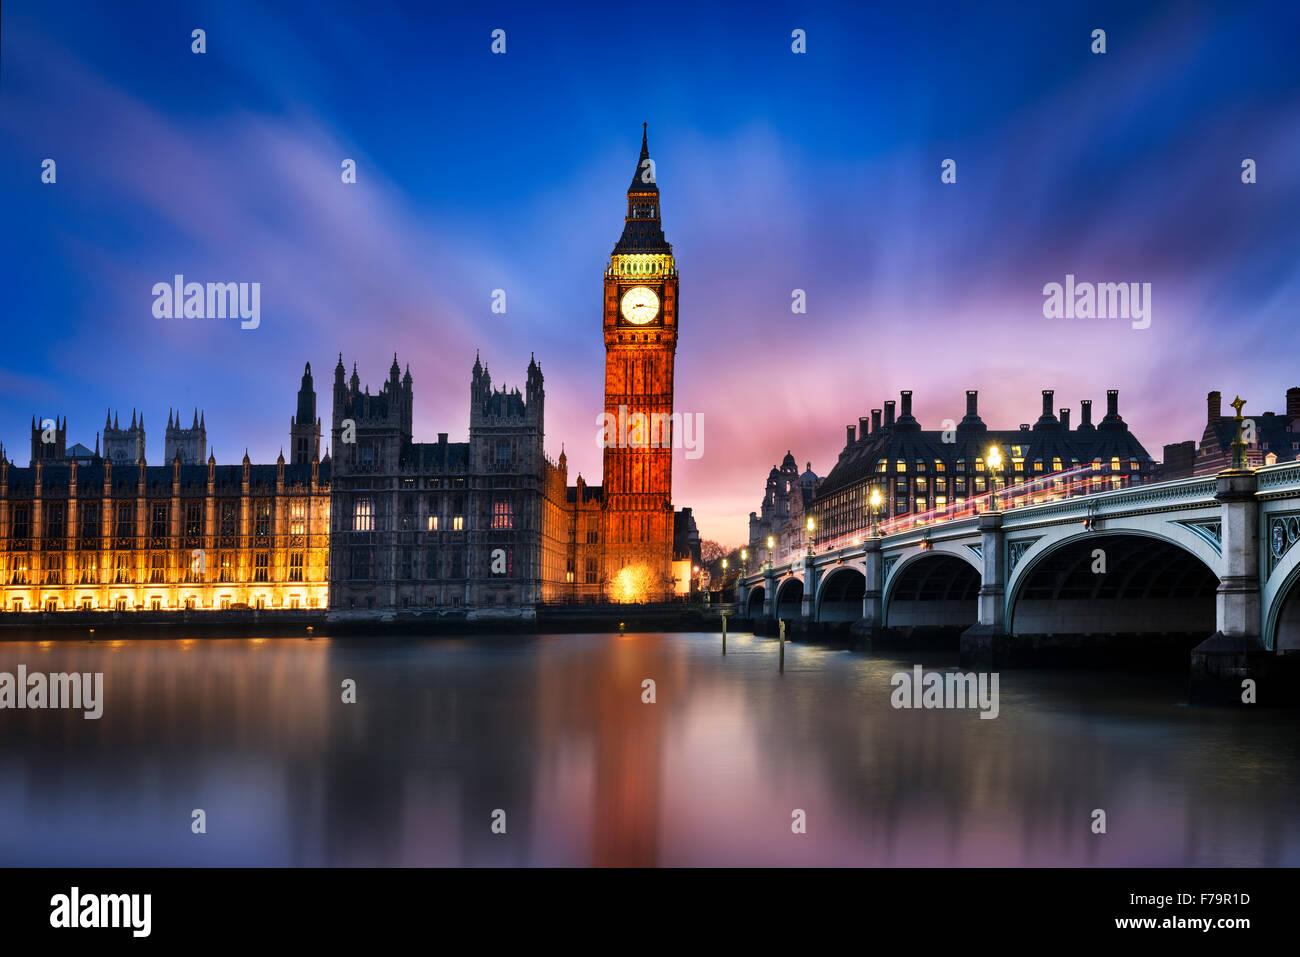 Big Ben and Westminster Bridge at dusk, London, UK - Stock Image